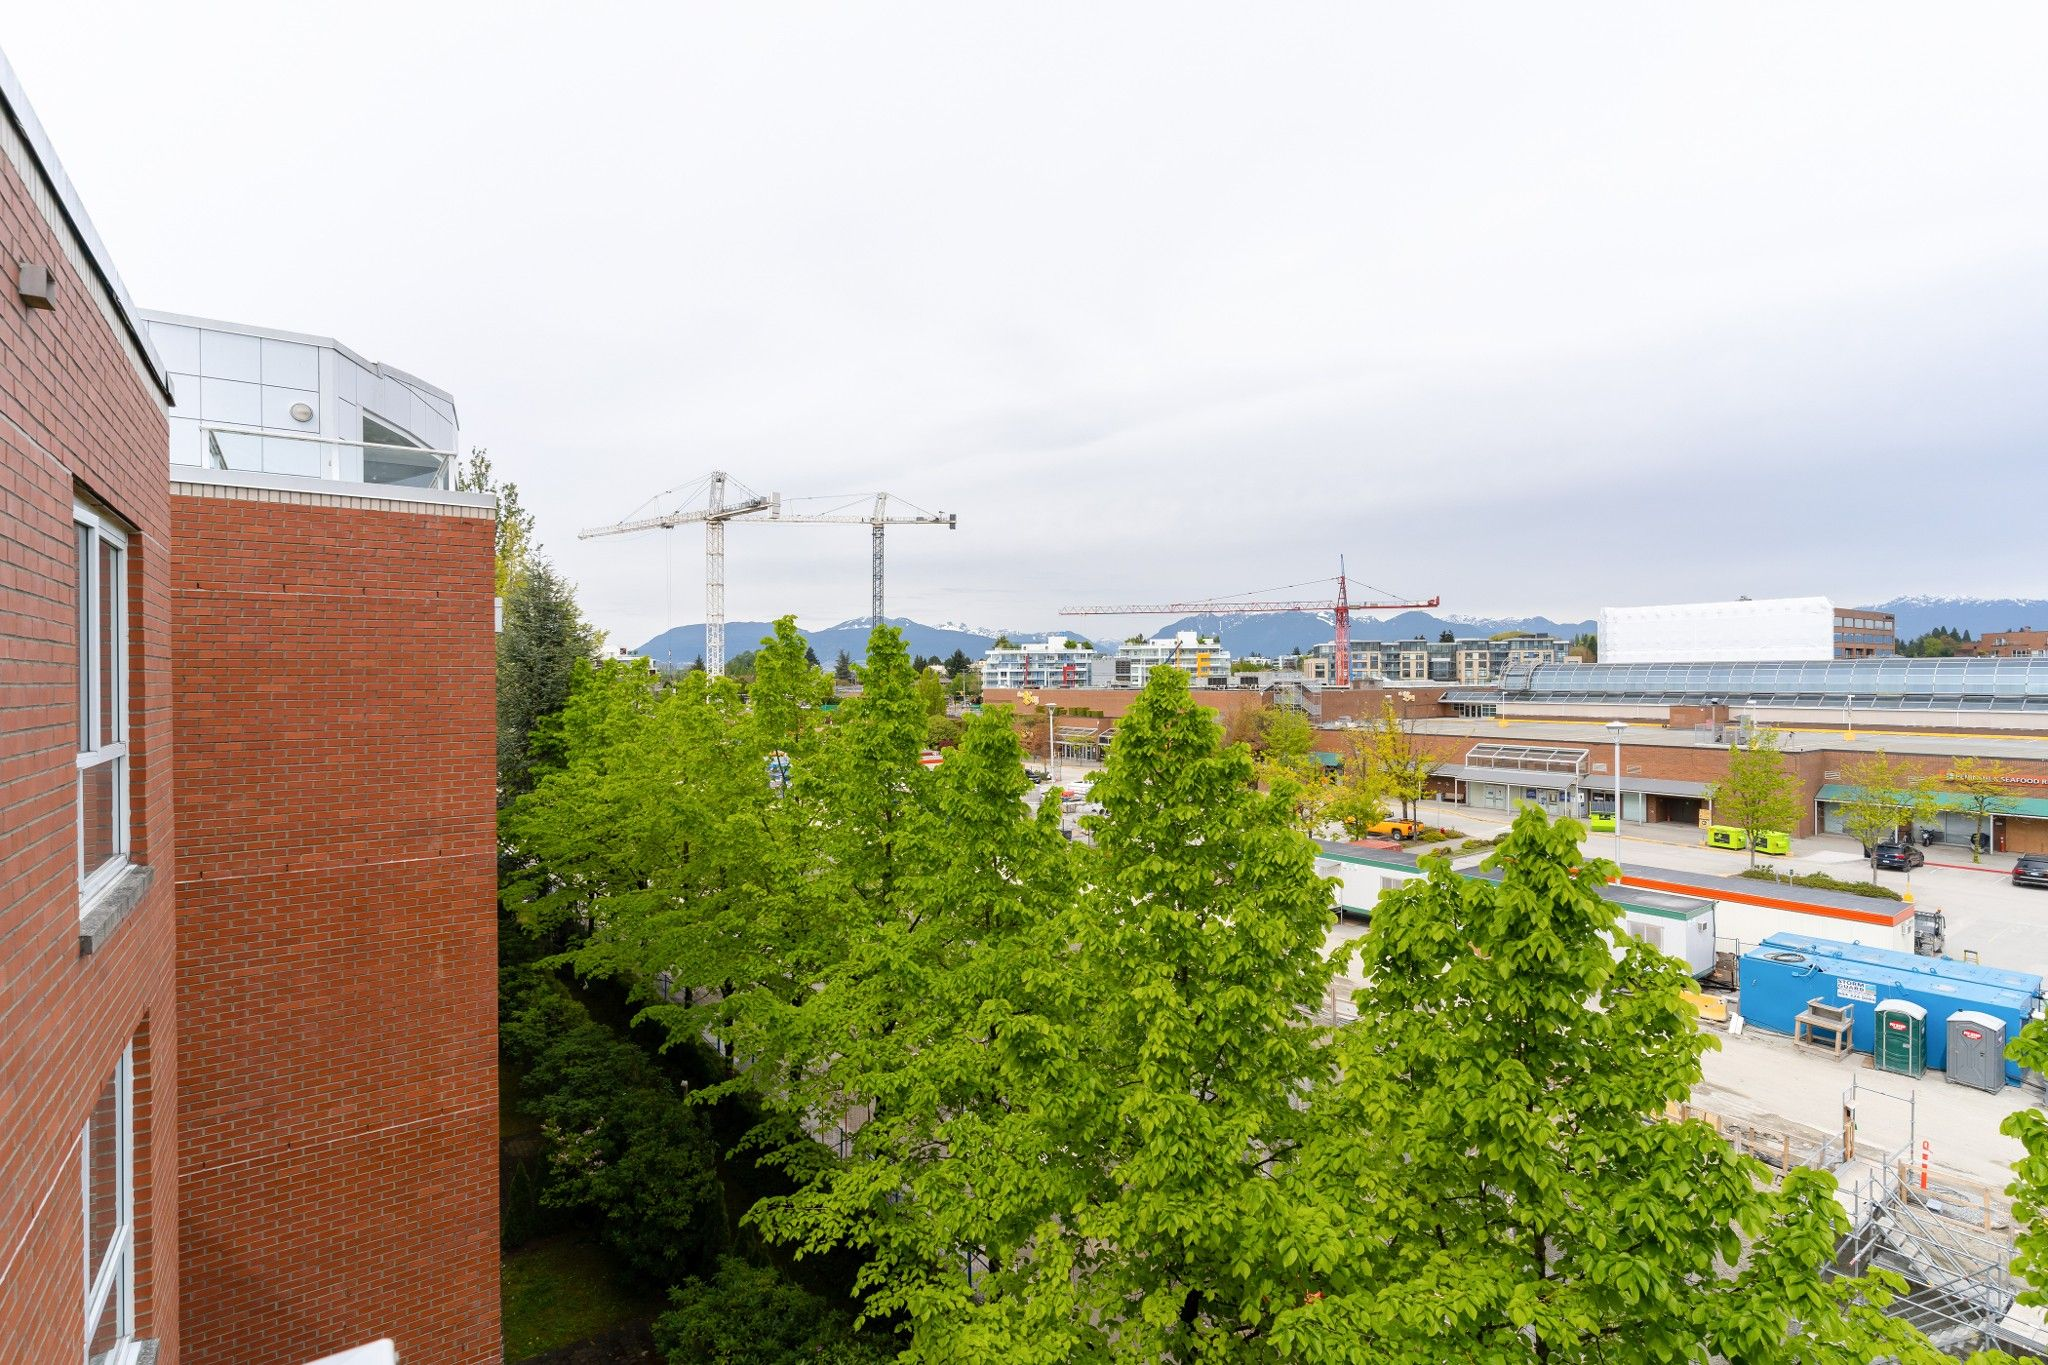 Photo 25: Photos: 507-688 FAIRCHILD RD in VANCOUVER: Oakridge VW Condo for sale (Vancouver West)  : MLS®# R2577379